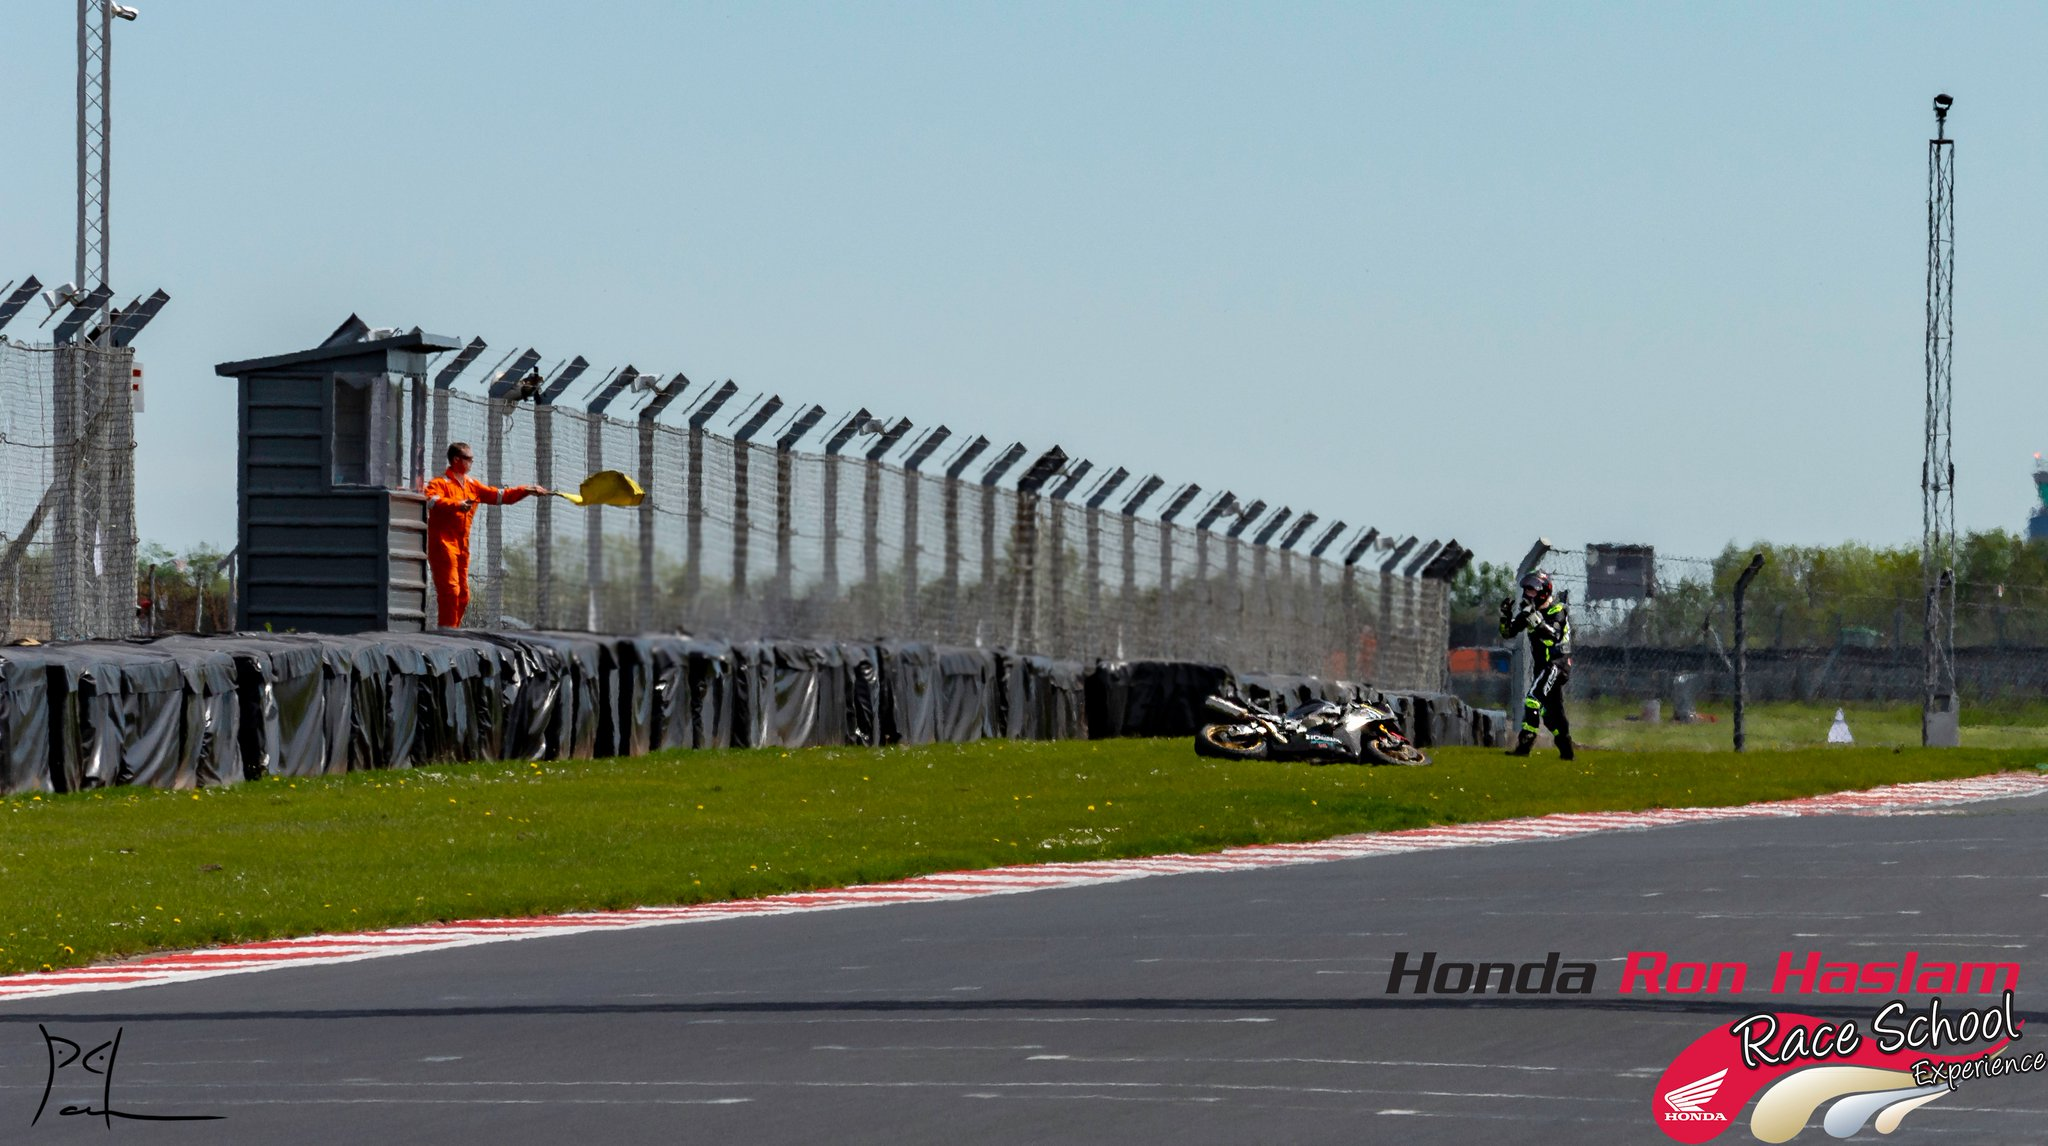 Ron Haslam race school crash